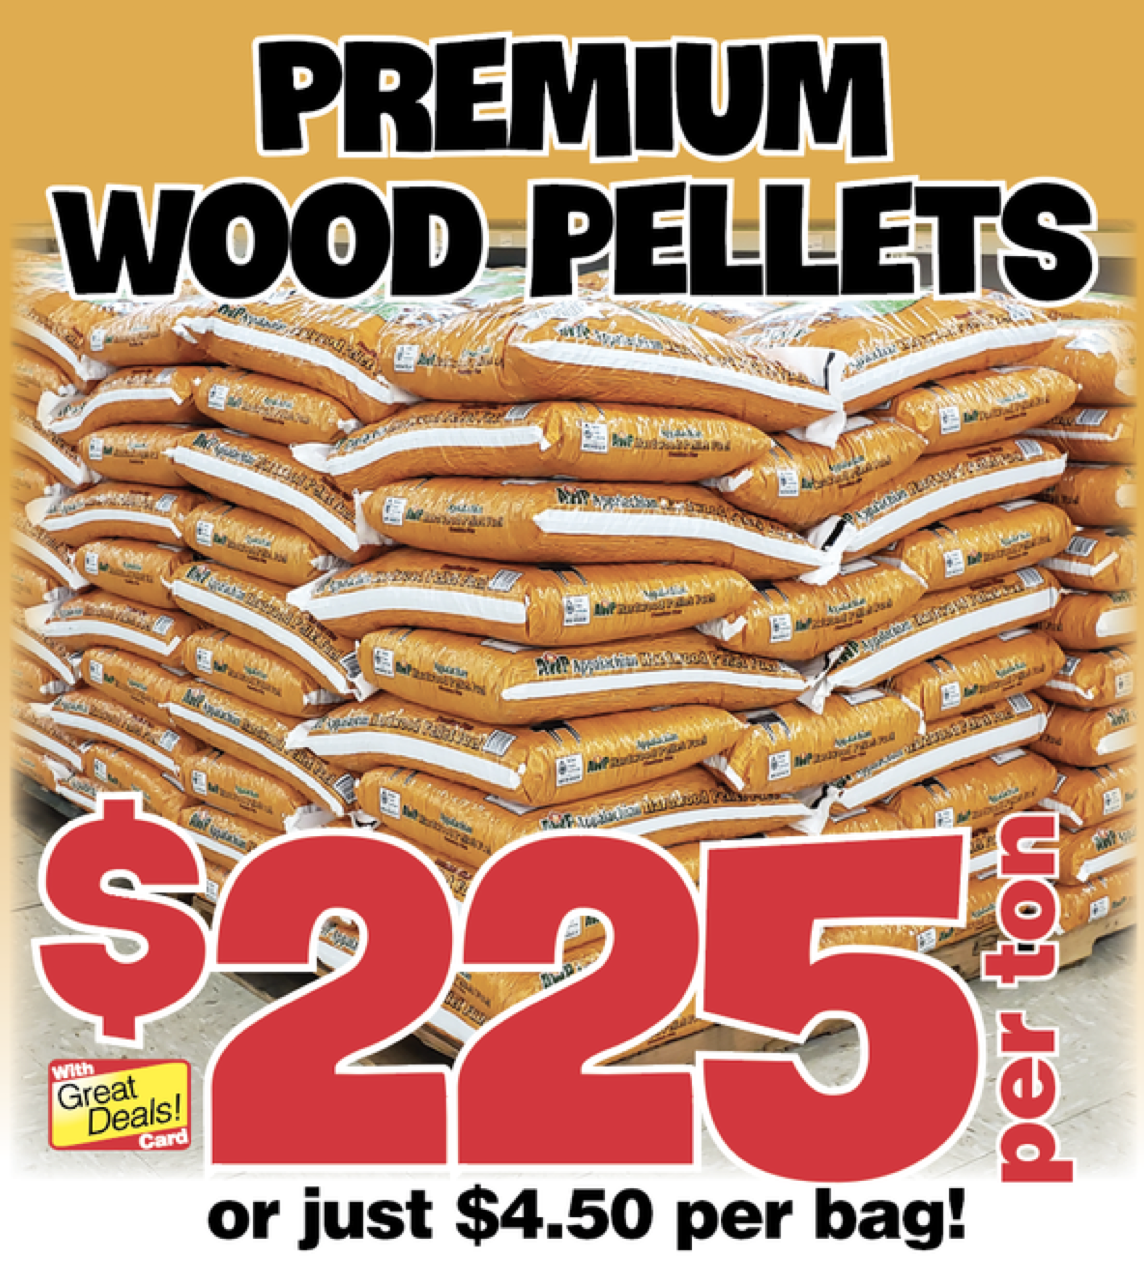 We Have Wood Pellets Sale Flyer Wood Pellets Pellet